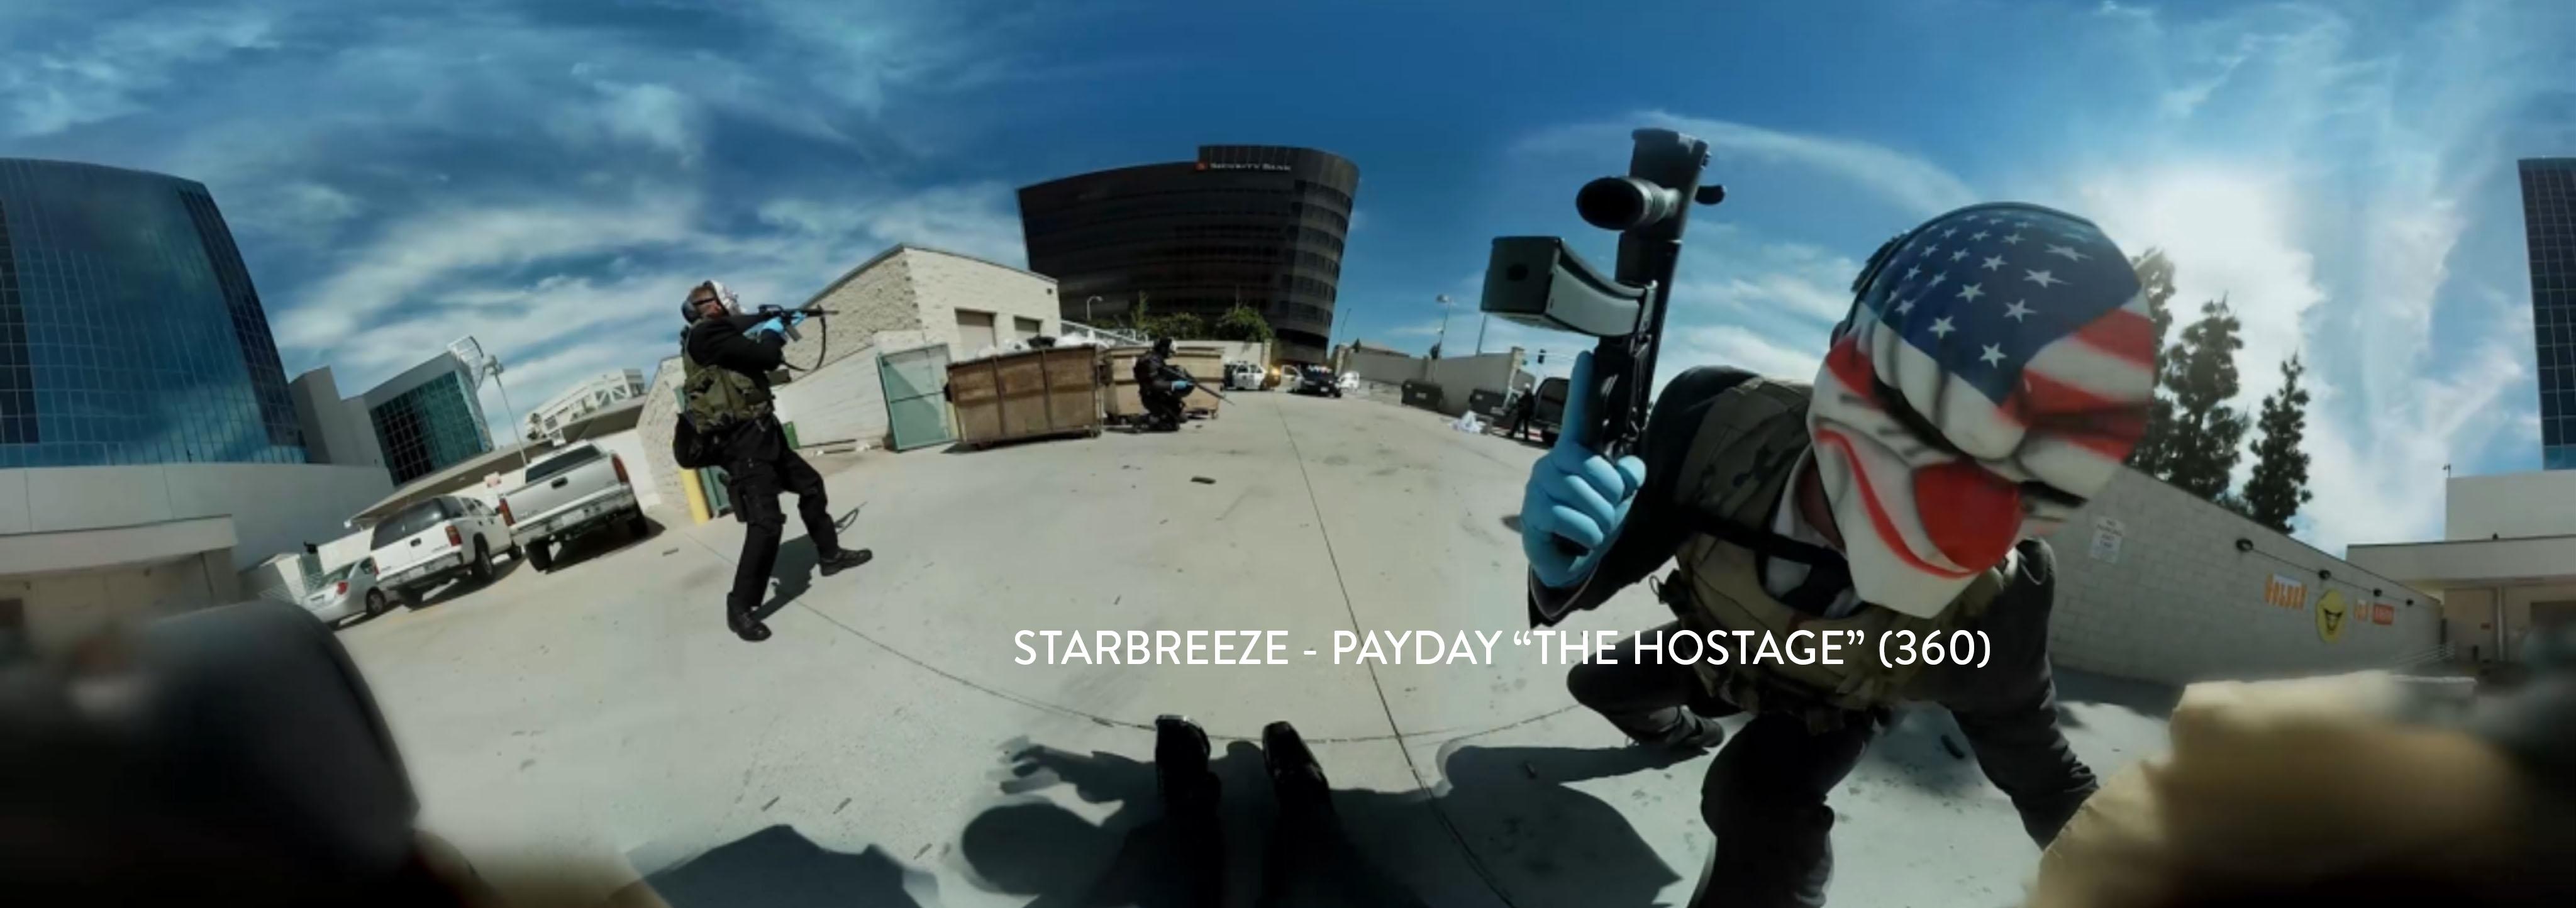 DQ_Splash__0003_STARBREEZE - PAYDAY